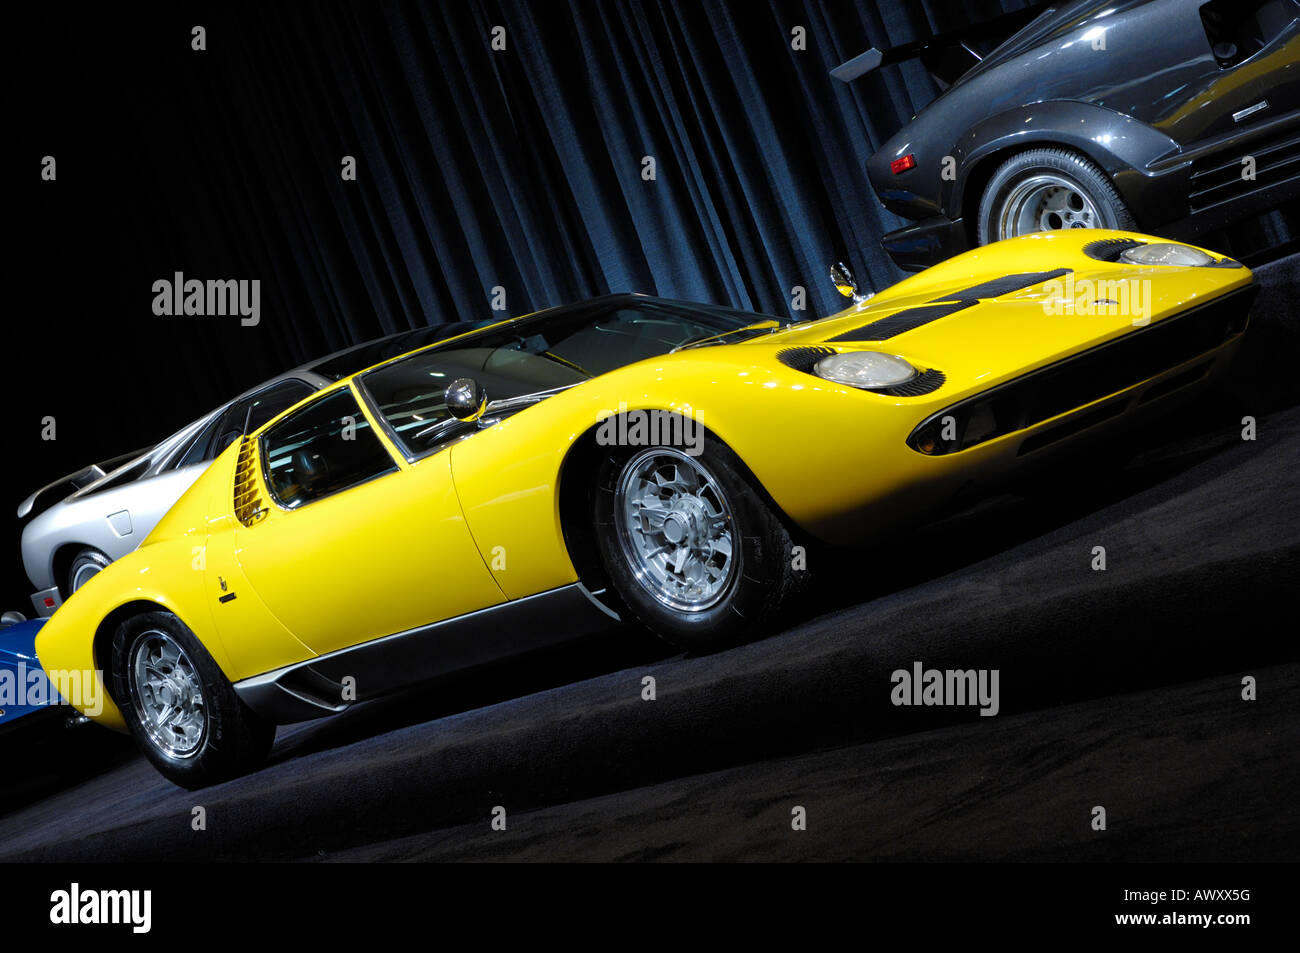 Lamborghini Miura 1969 Retro Super Car Stock Photo 16673499 Alamy